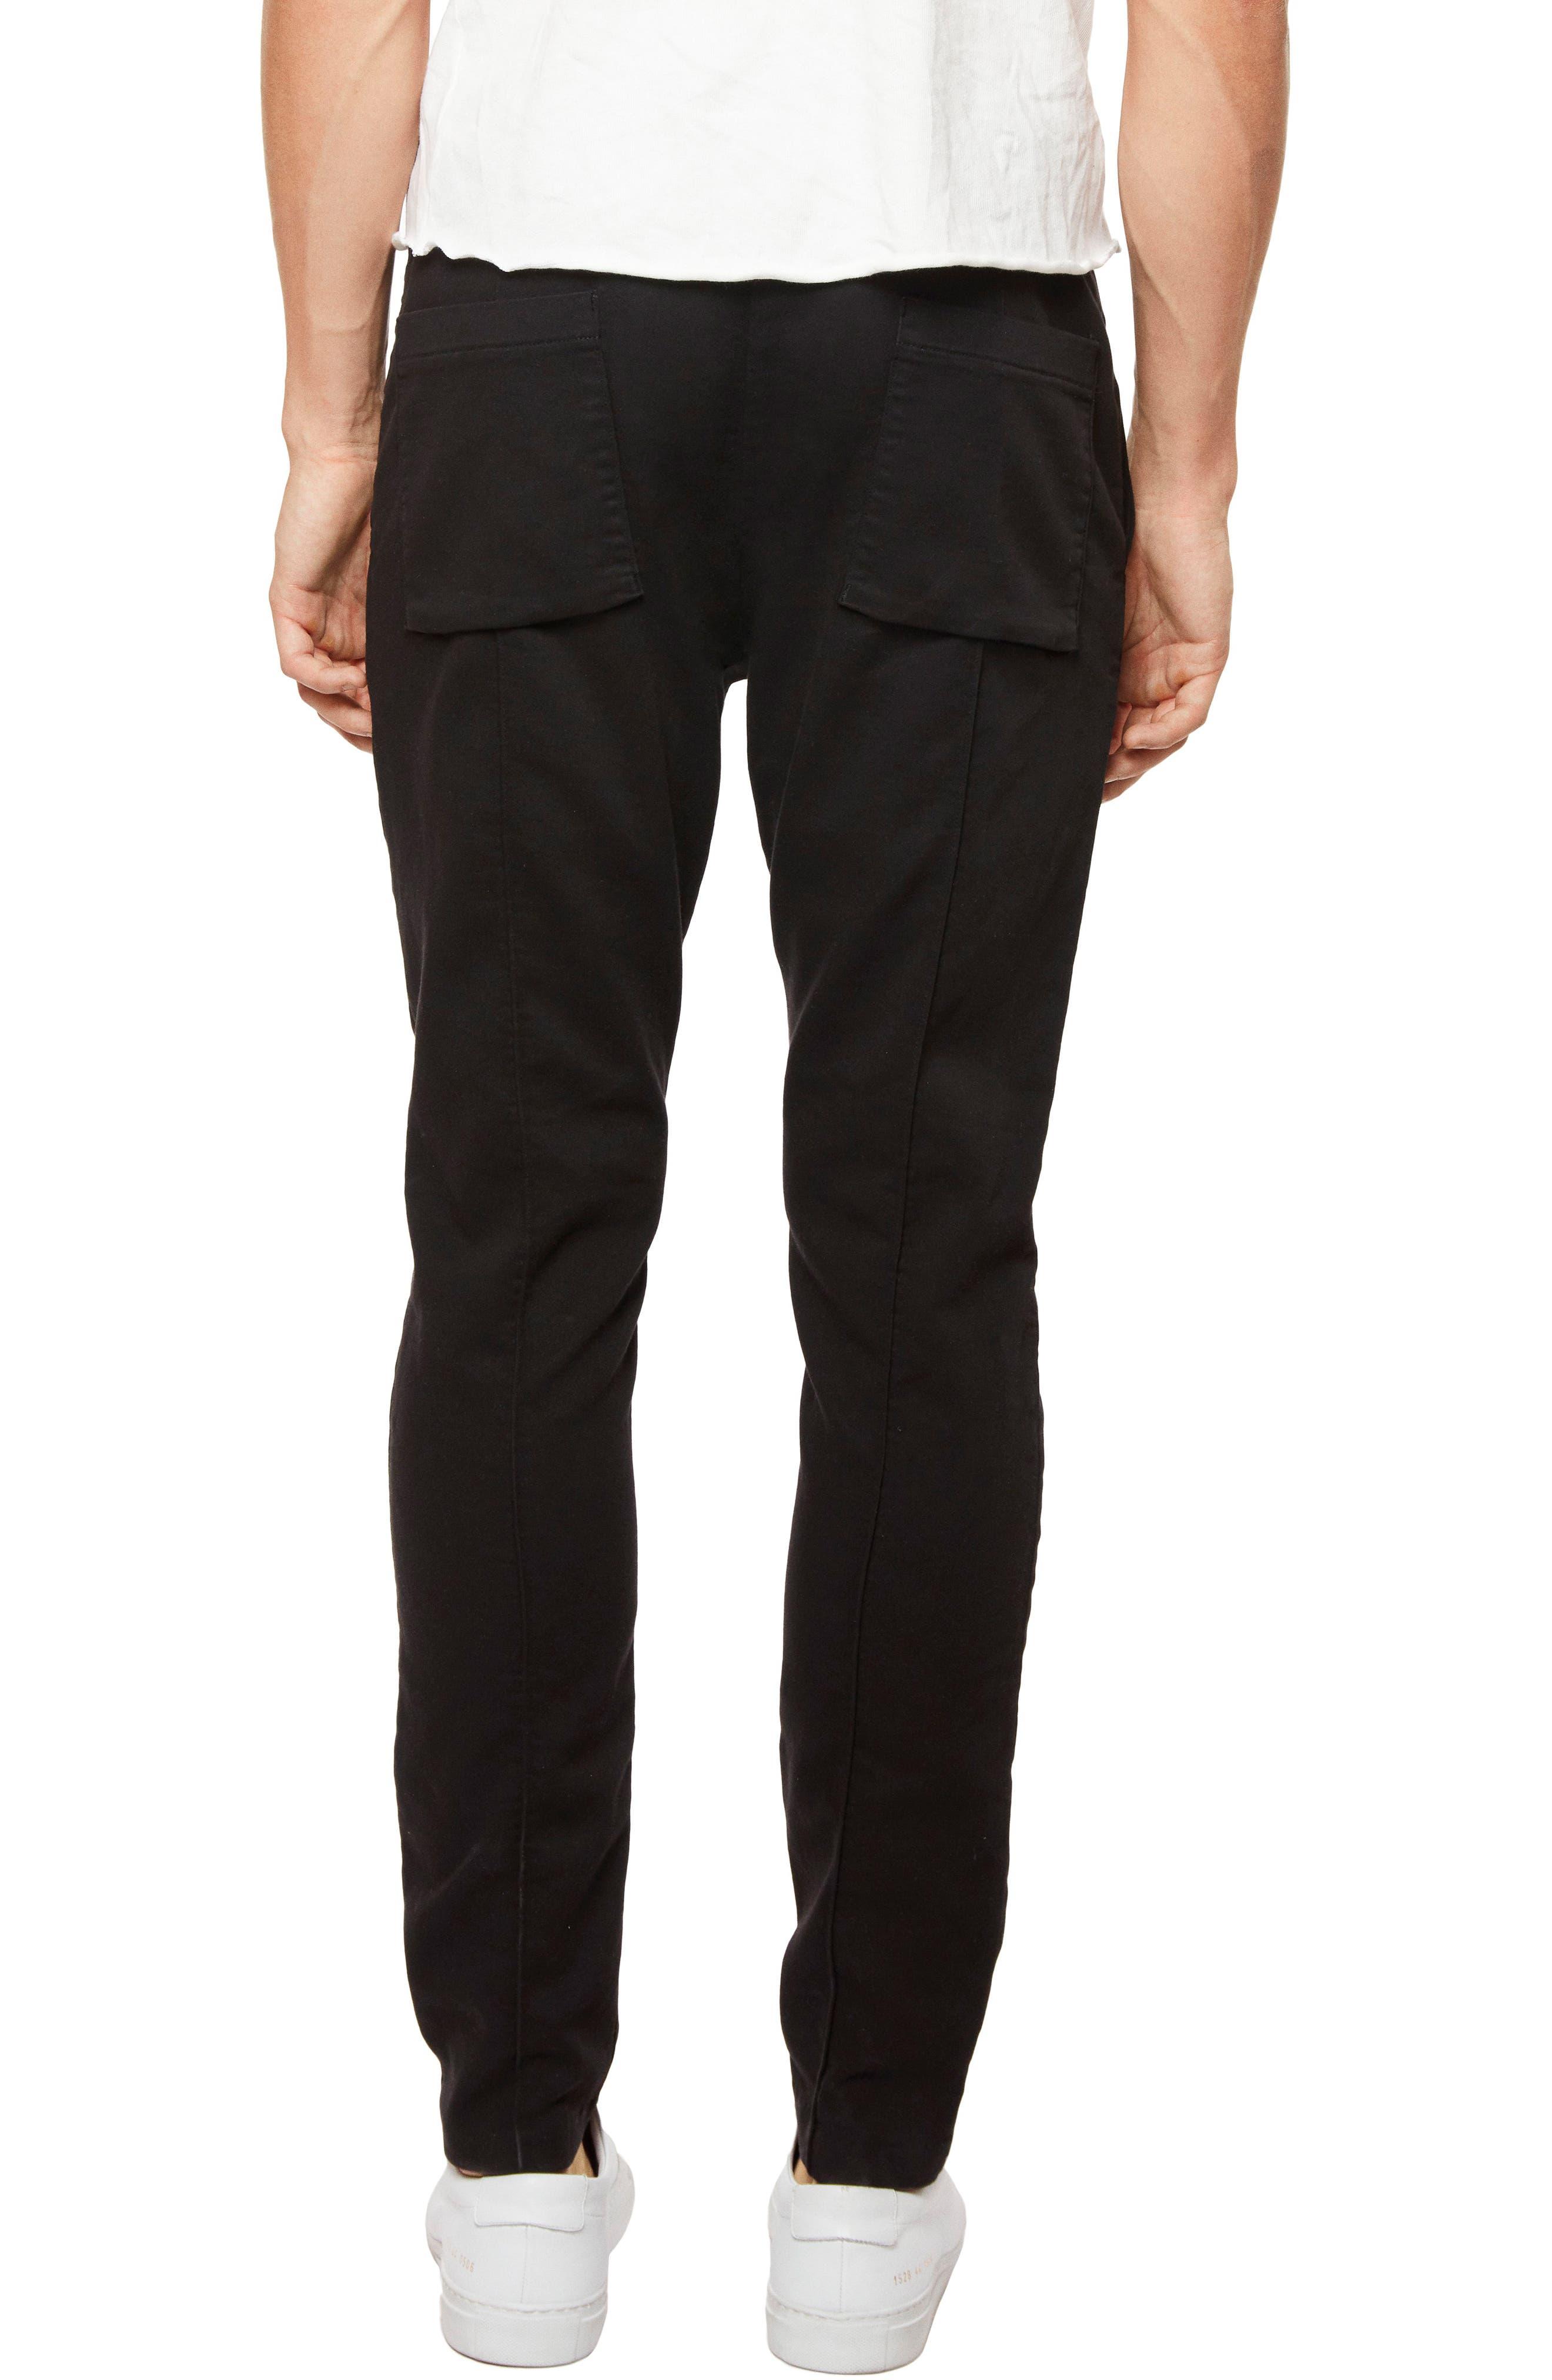 Wakat Relaxed Fit Jogger Pants,                             Alternate thumbnail 2, color,                             Black